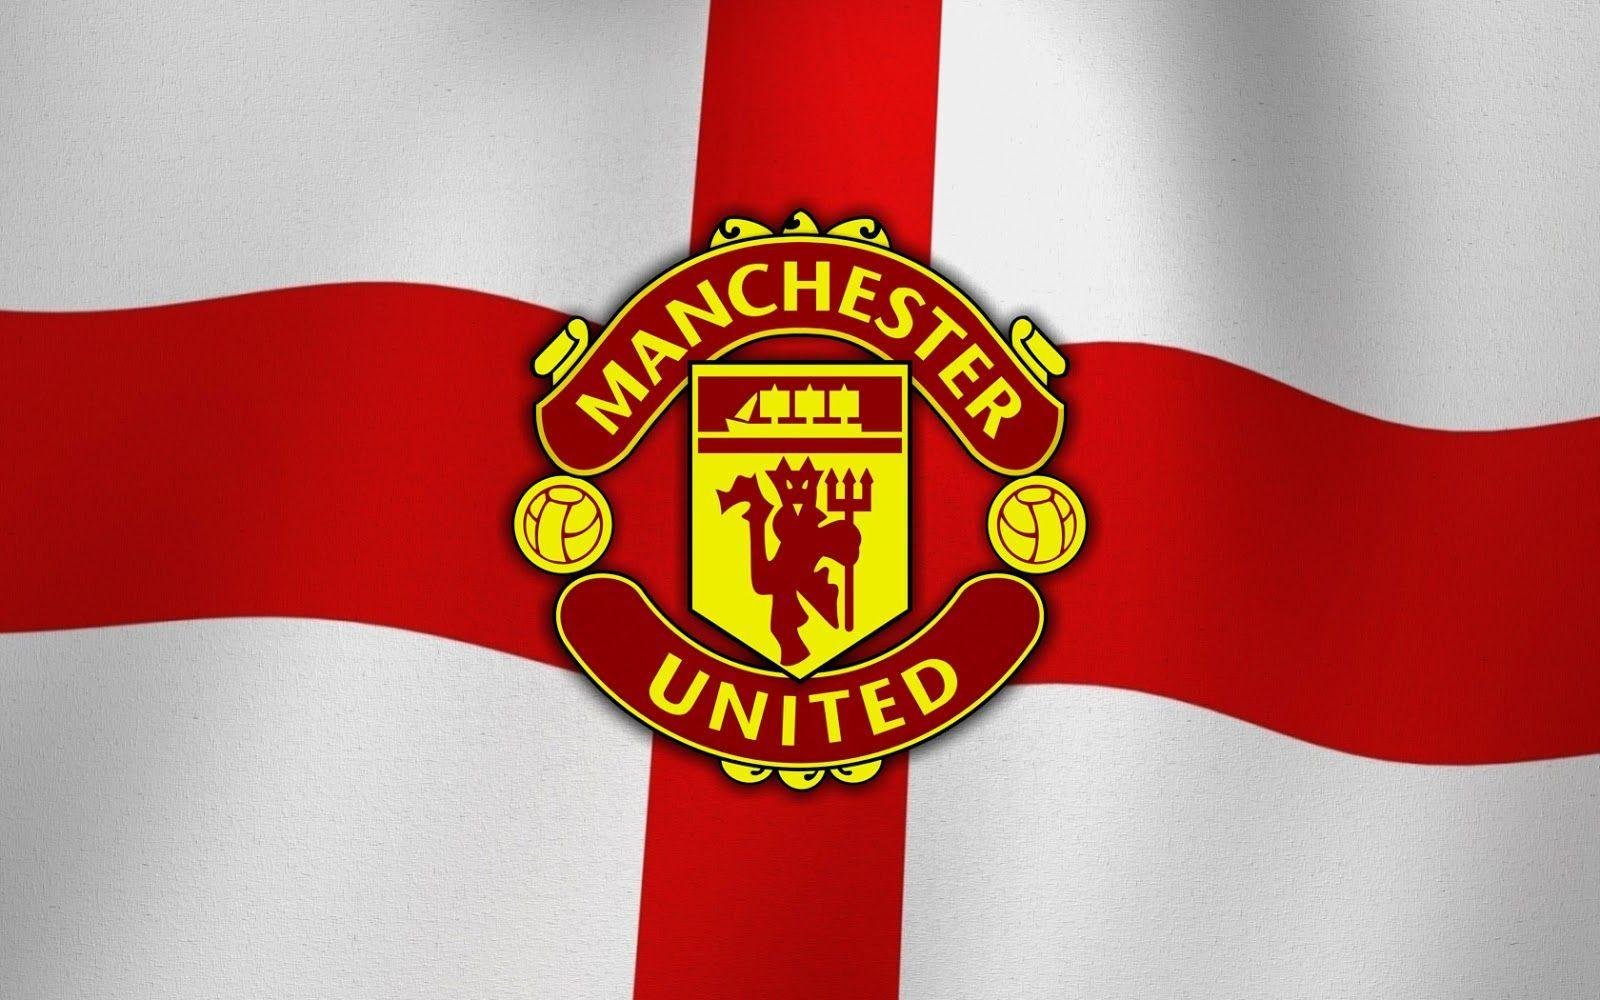 Manchester United Logo Football Club Wallpaper #6749 Wallpaper ...